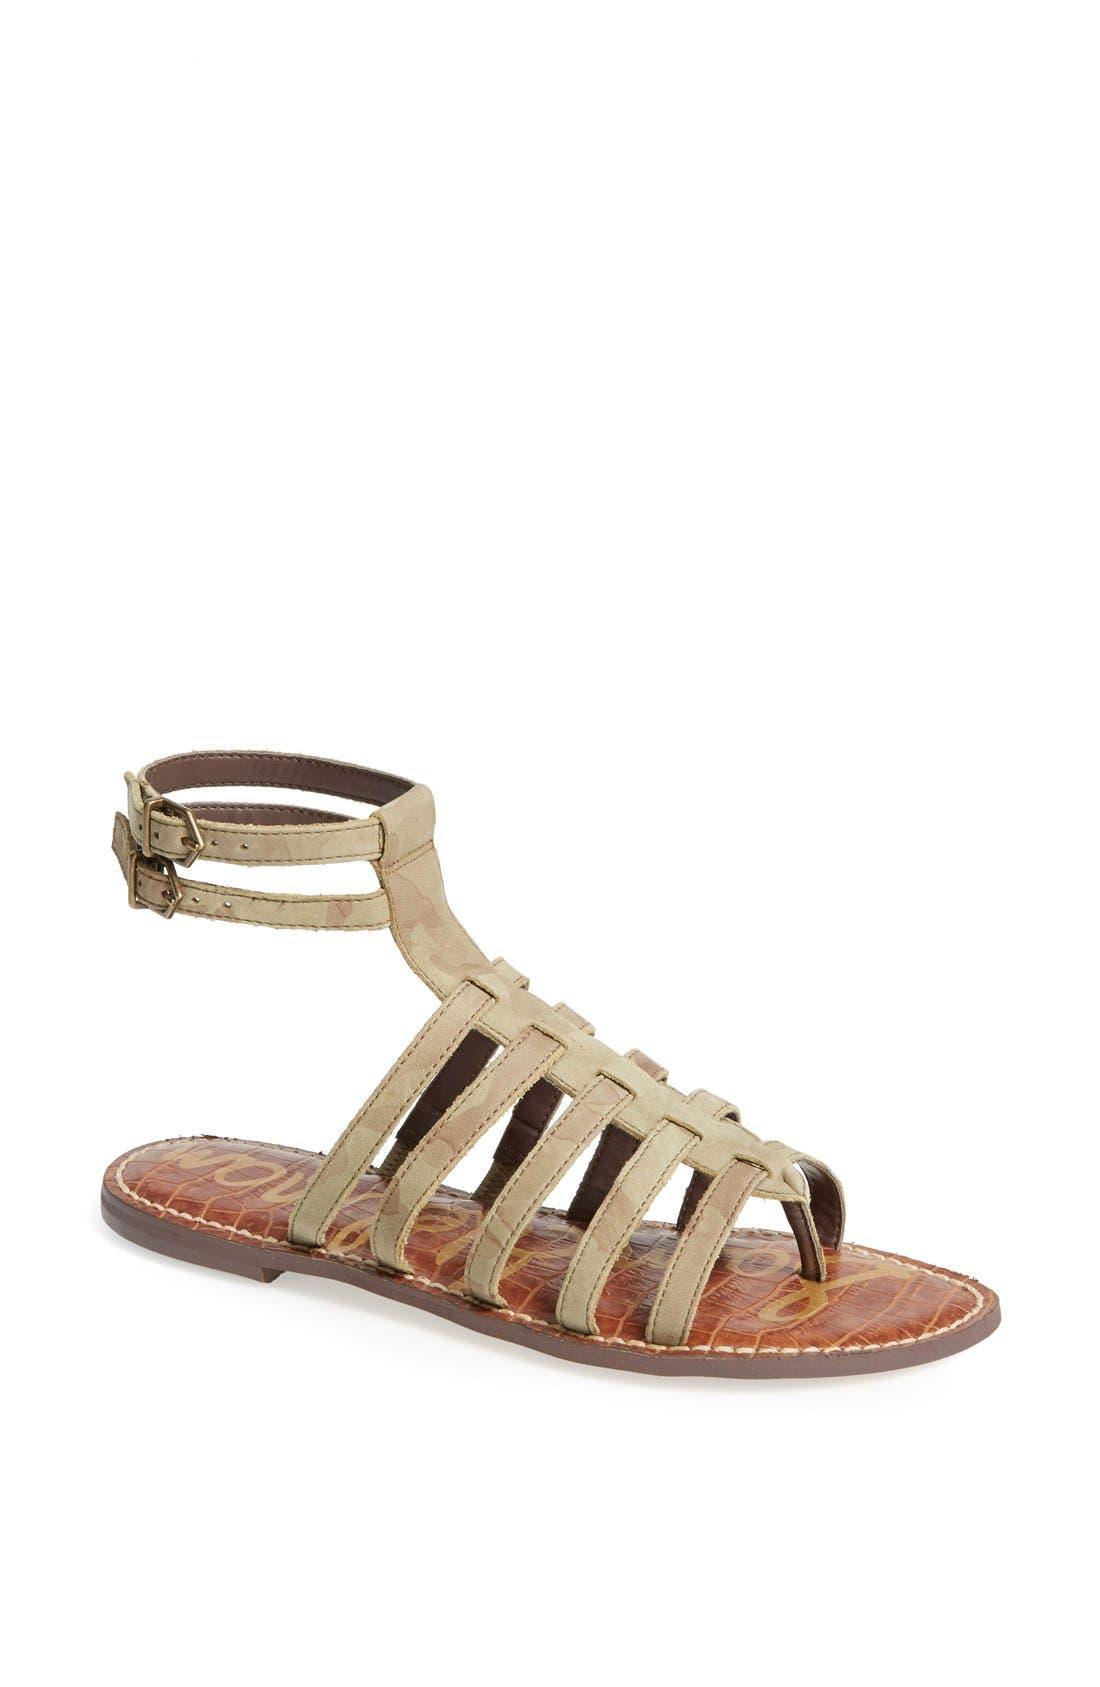 Alternate Image 1 Selected - Sam Edelman 'Gilda' Gladiator Sandal